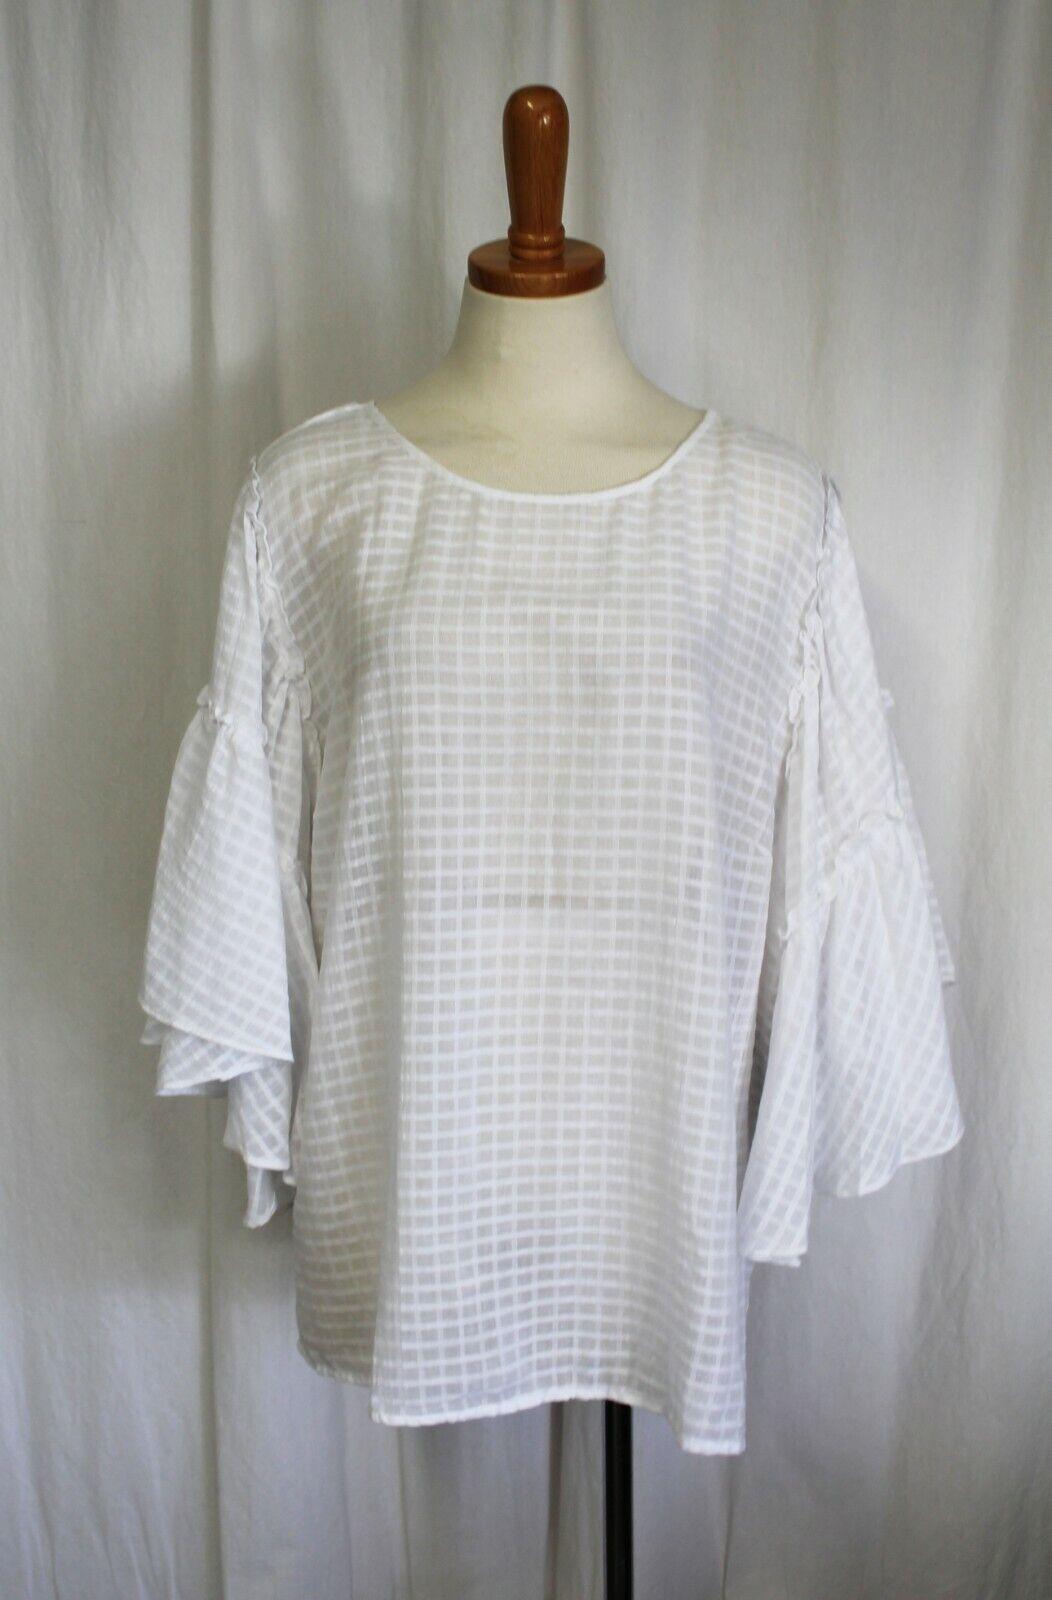 VInce Camuto Texturot Grid Ruffle Drop Shoulder Blouse Top Weiß 2X Plus